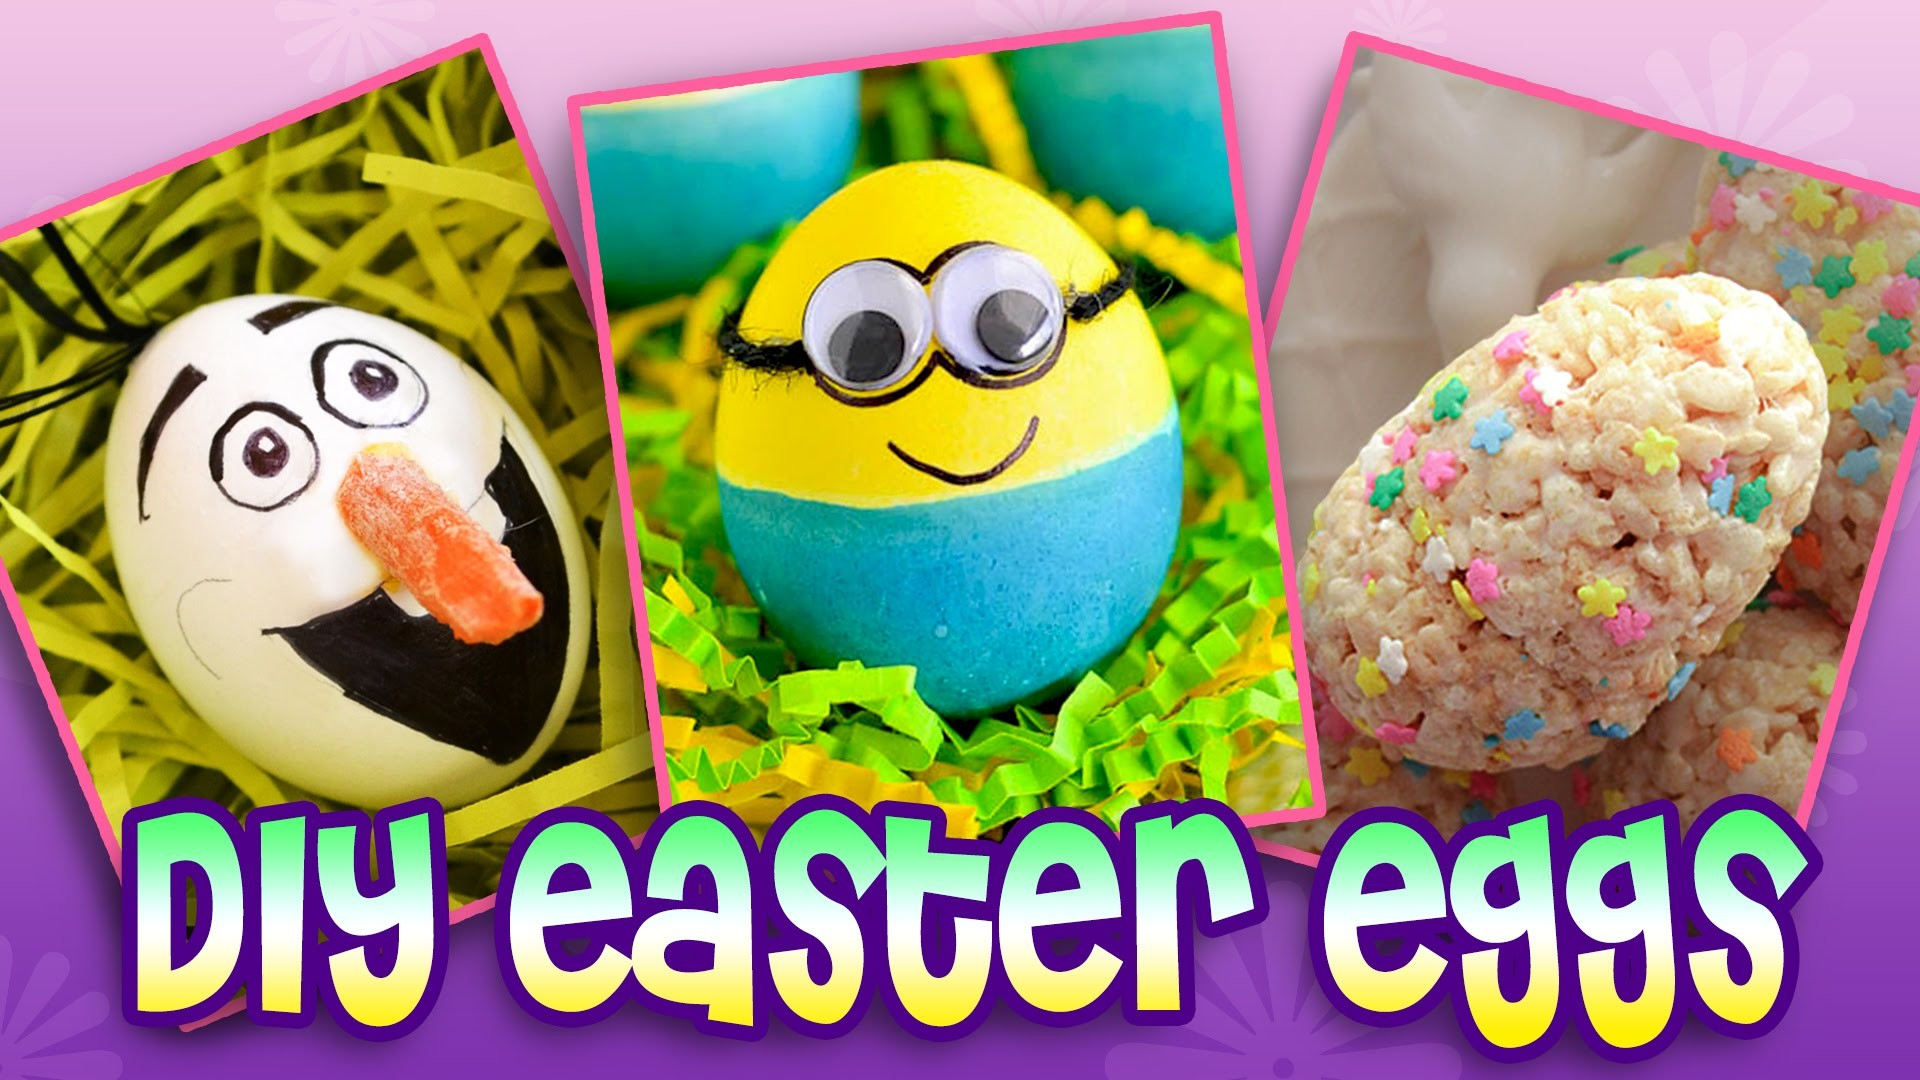 Easter Eggs | Top 10 DIY Easter Egg Ideas!